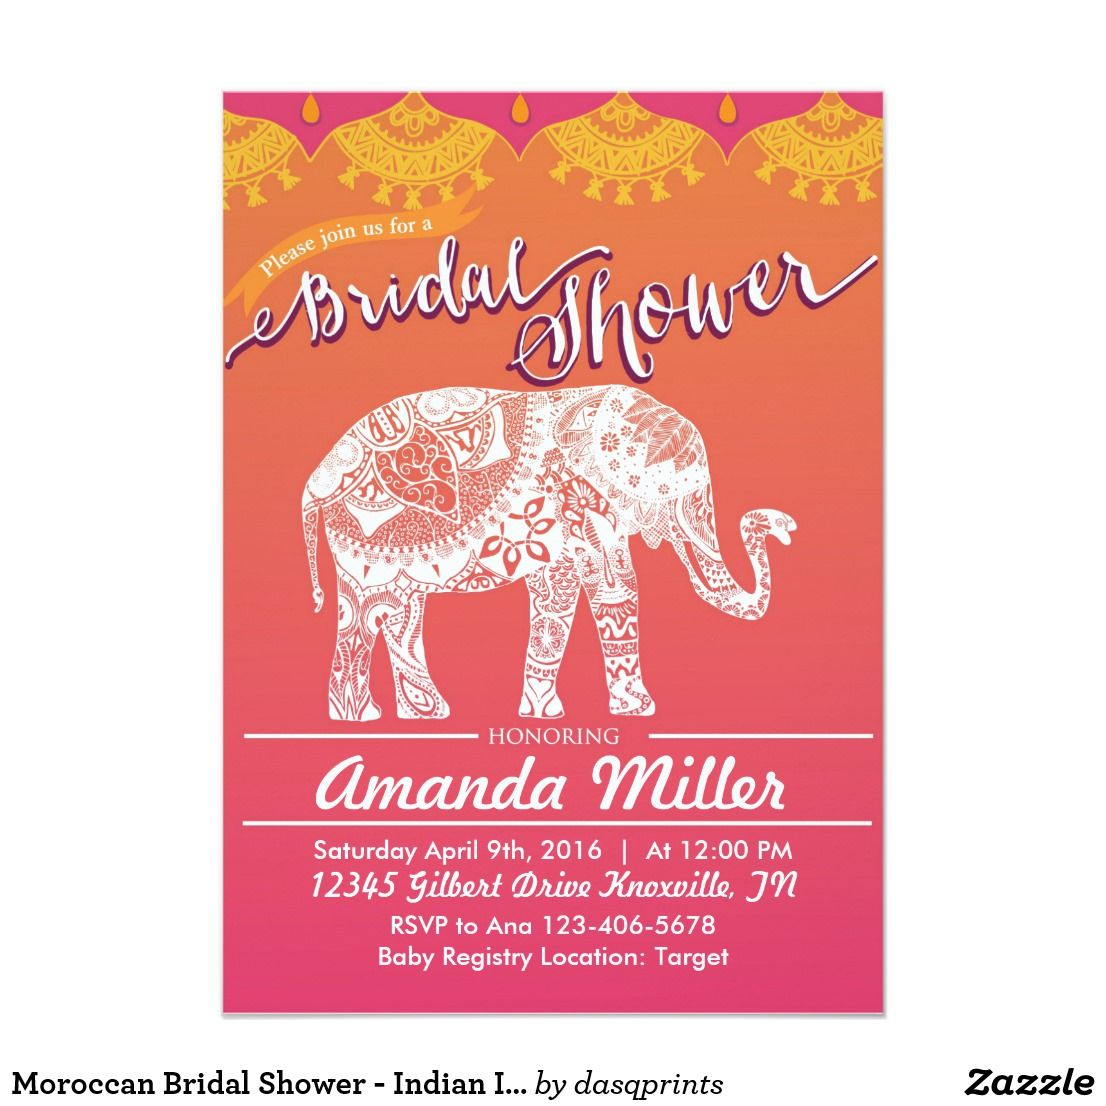 Moroccan Bridal Shower - Indian Inspiration Invitation | Pinterest ...